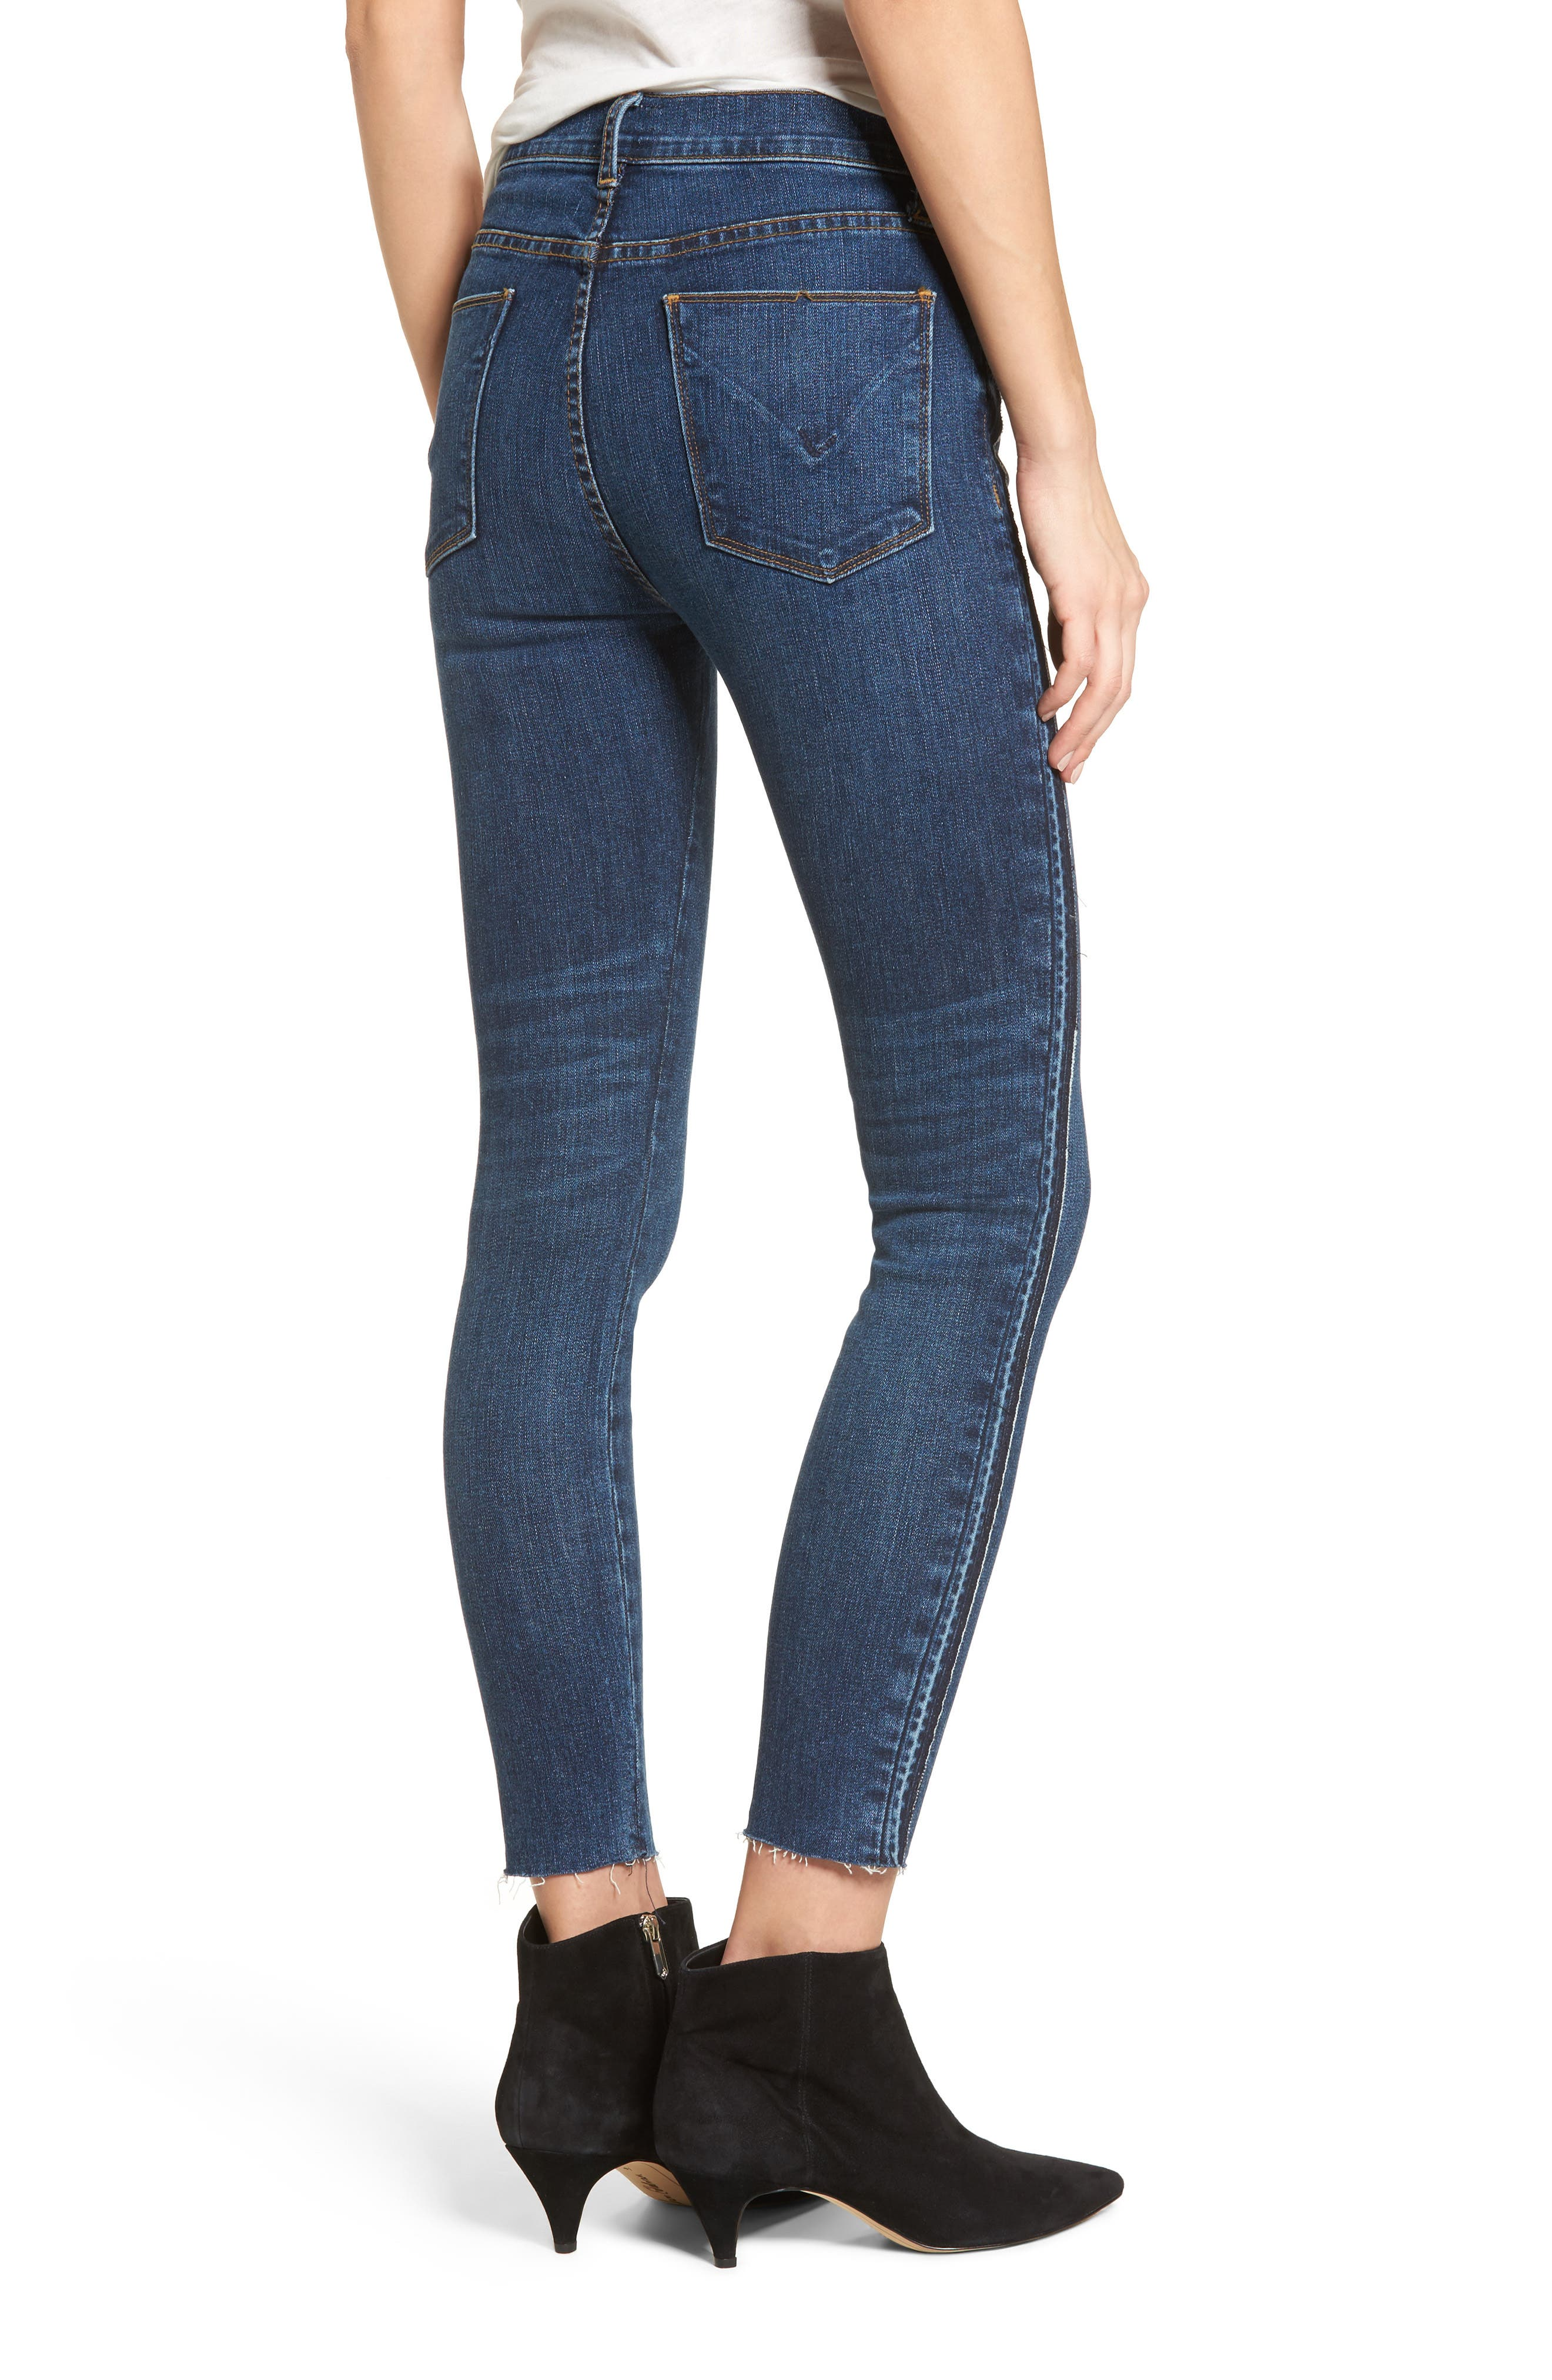 Barbara High Waist Super Skinny Jeans,                             Alternate thumbnail 2, color,                             400